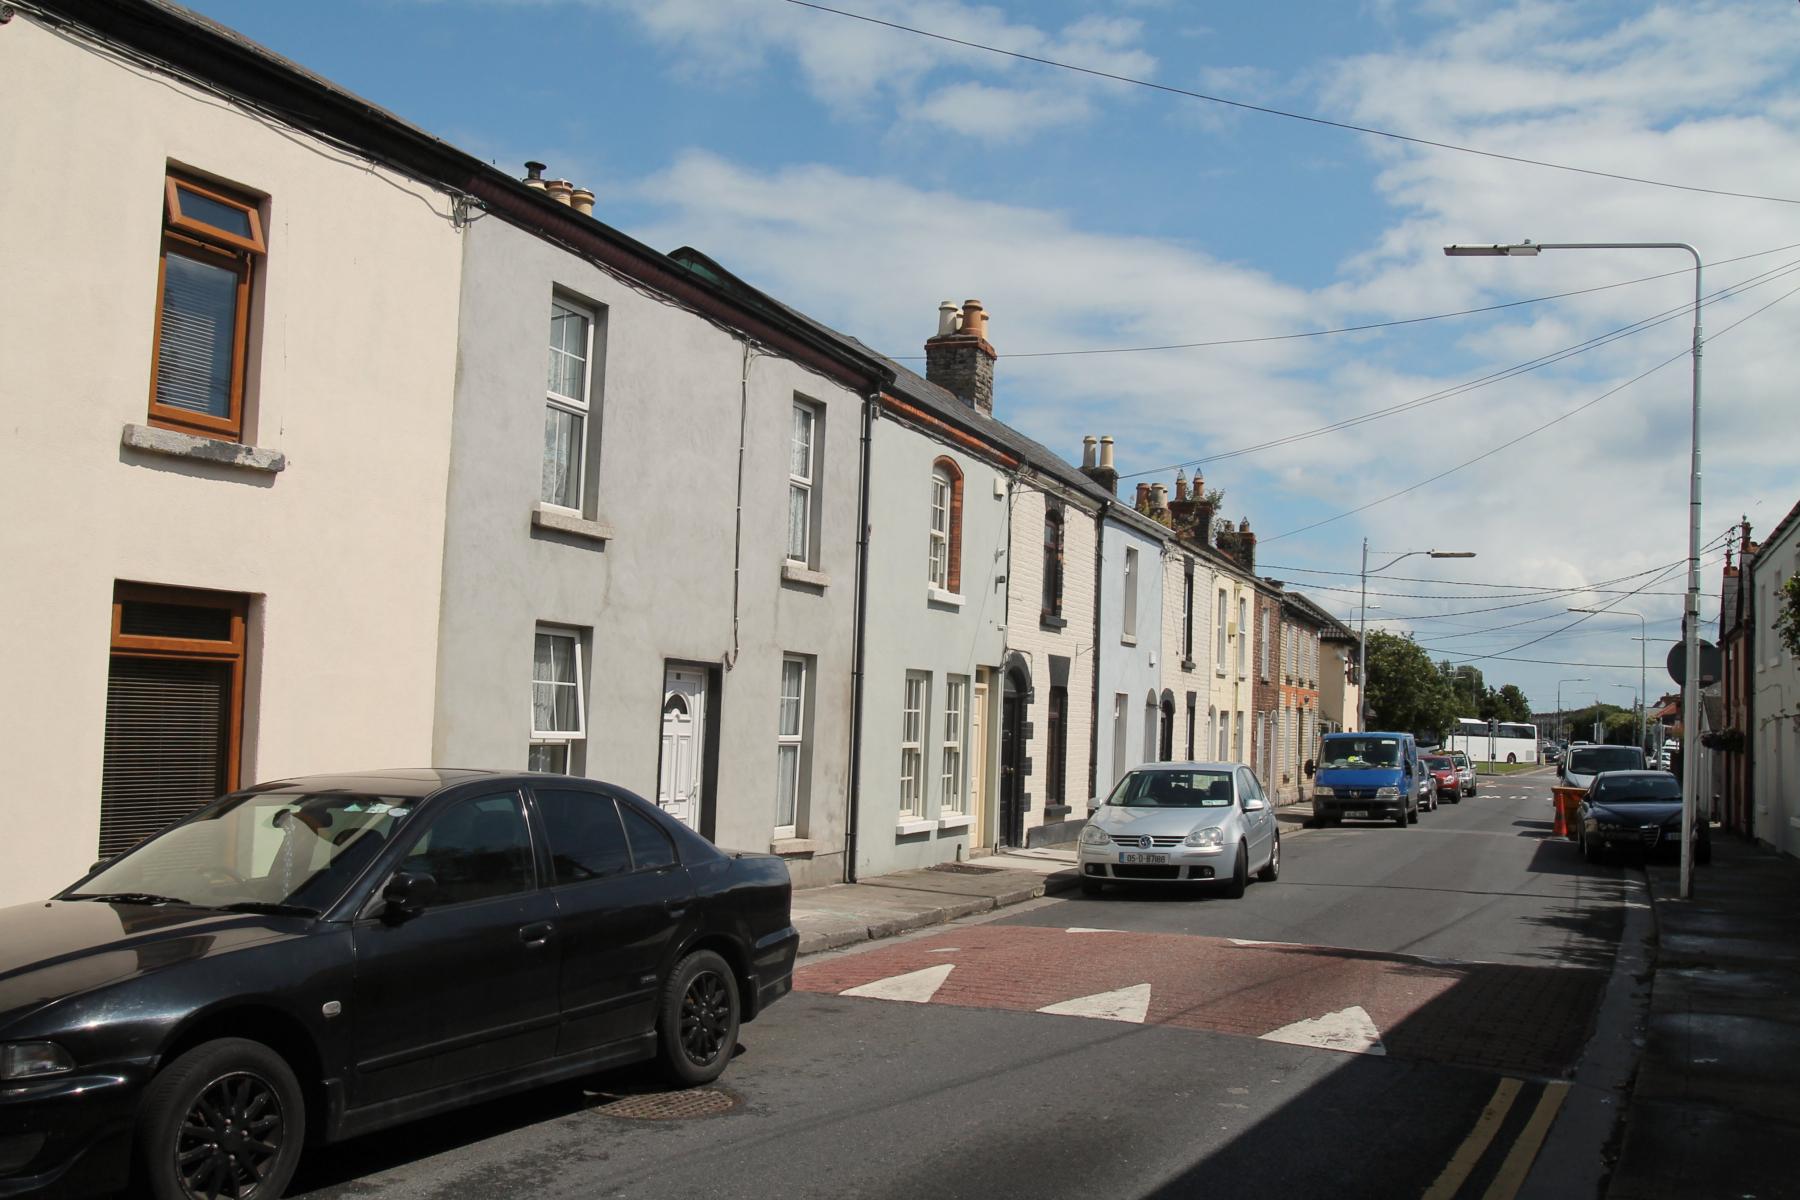 House To Let – Dublin 4 – 38 Bath Street, Irishtown, Dublin 4